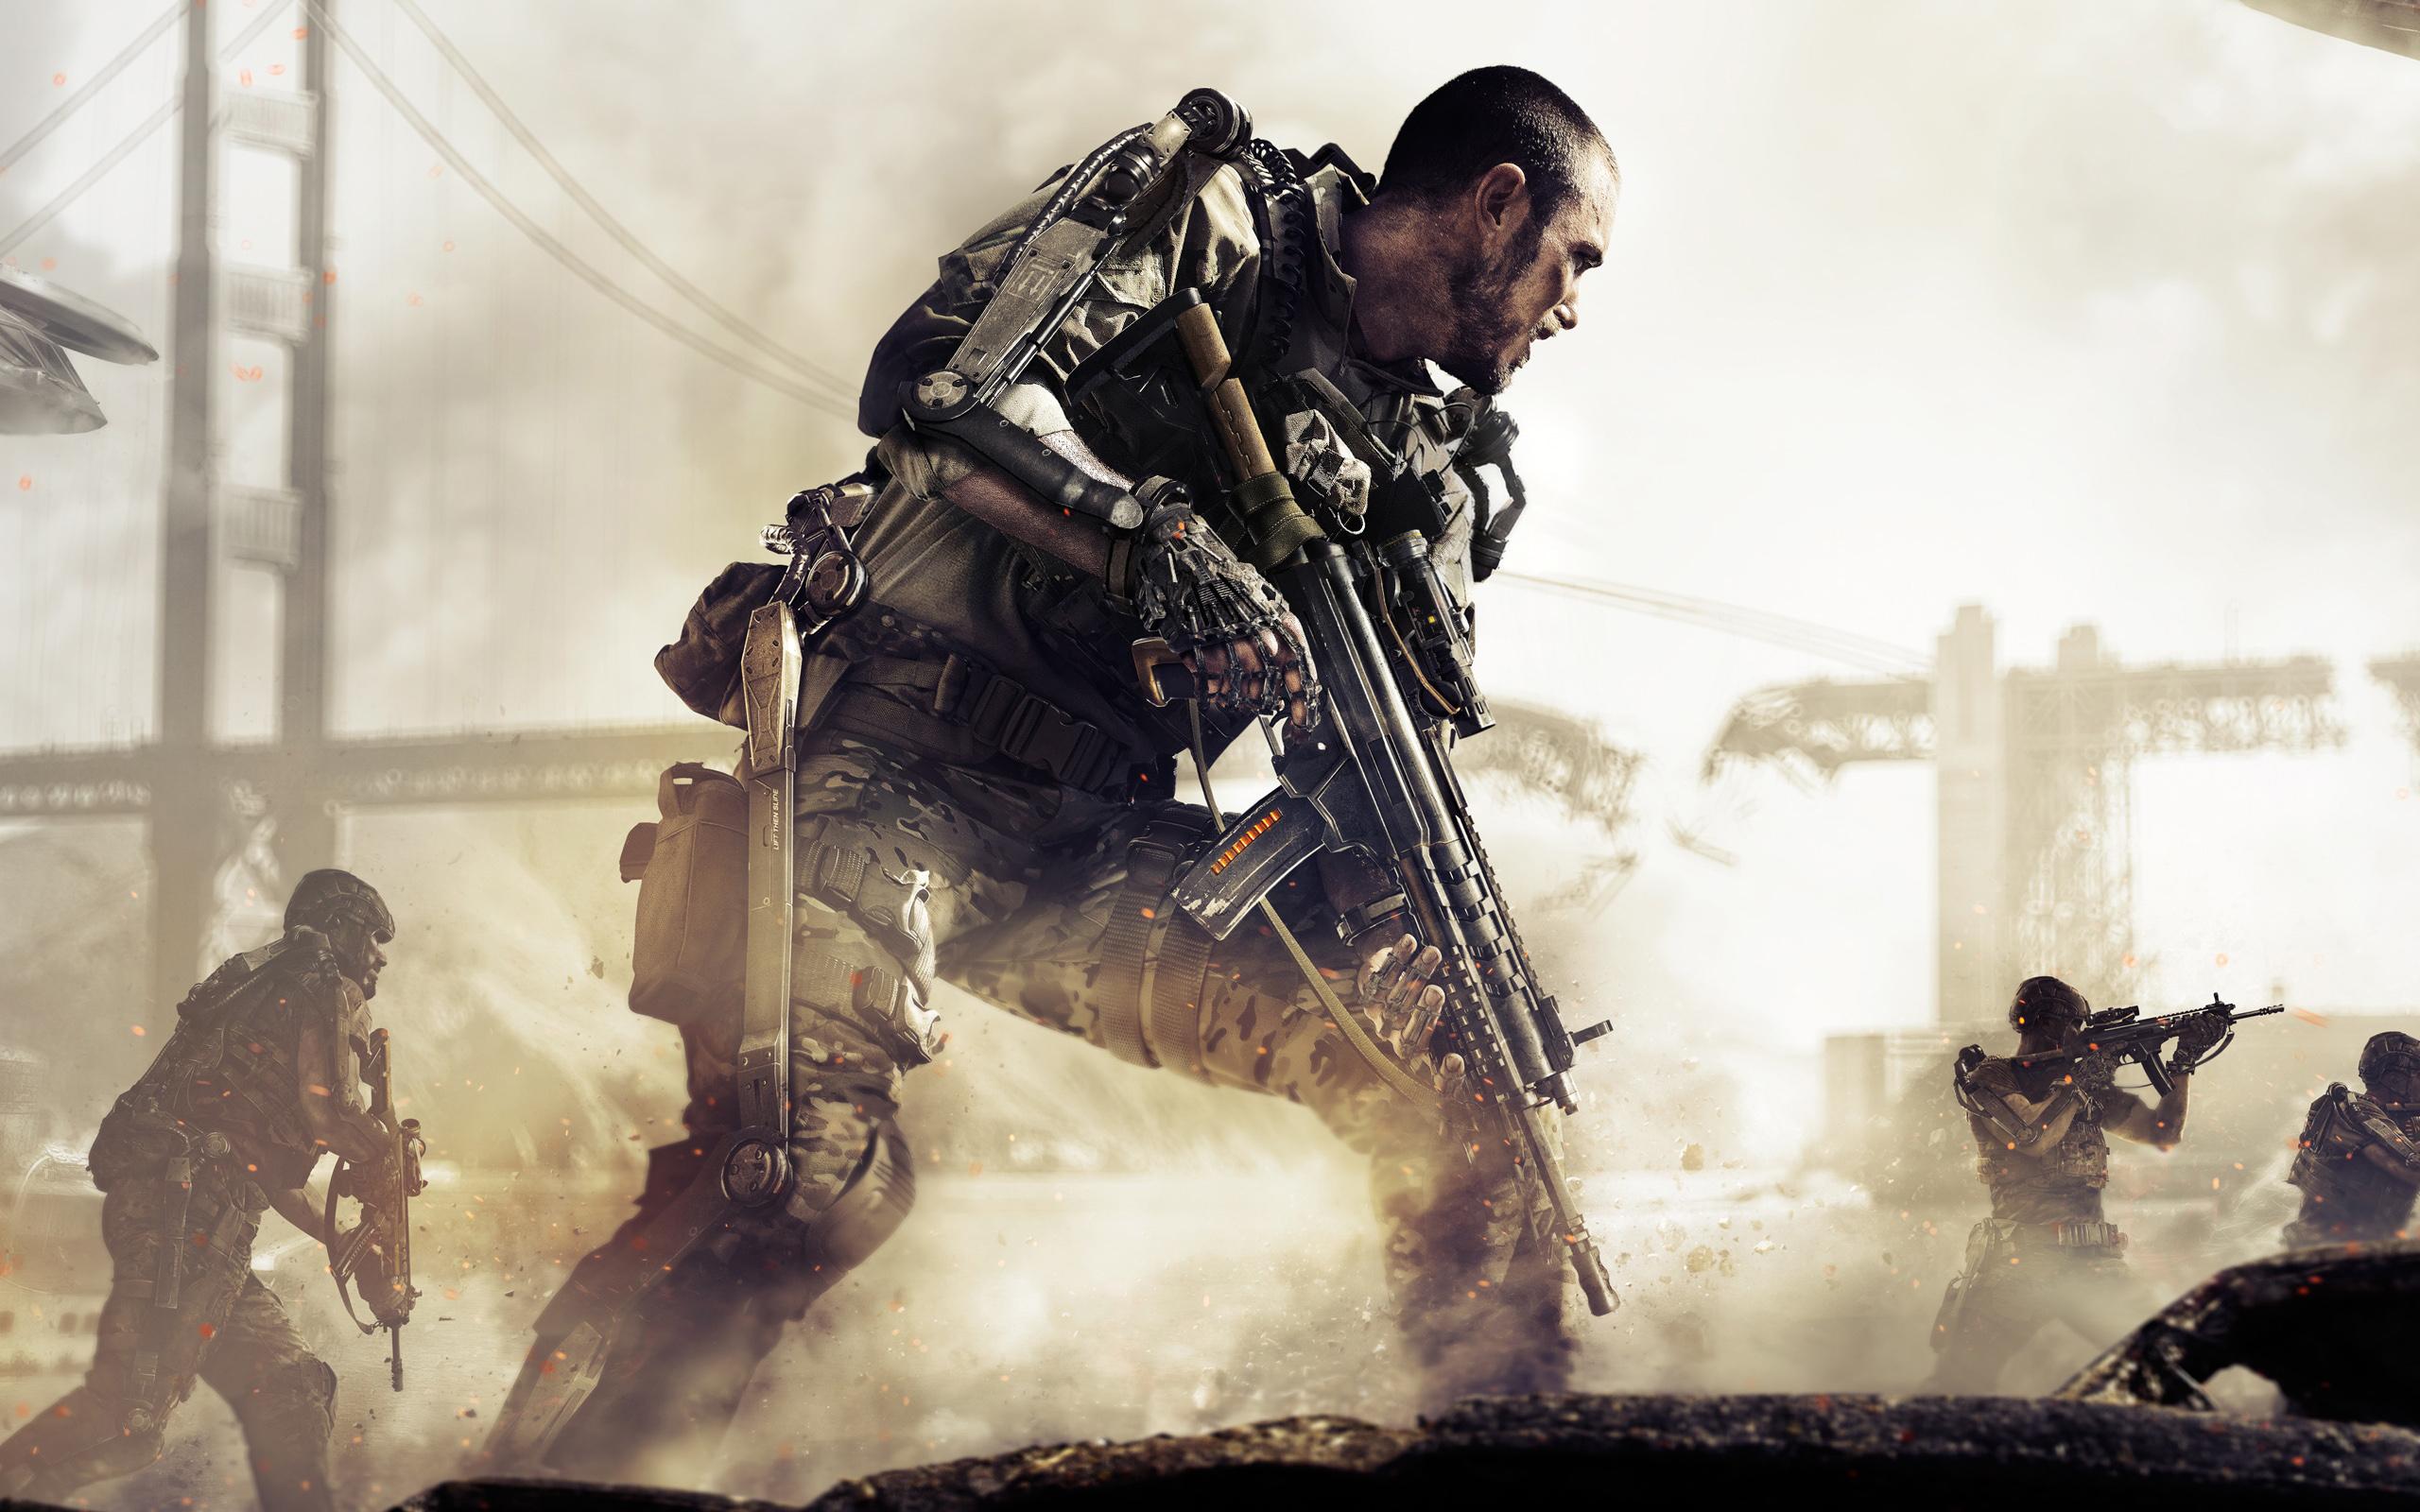 Call of Duty Advanced Warfare Wallpapers HD Wallpapers 2560x1600